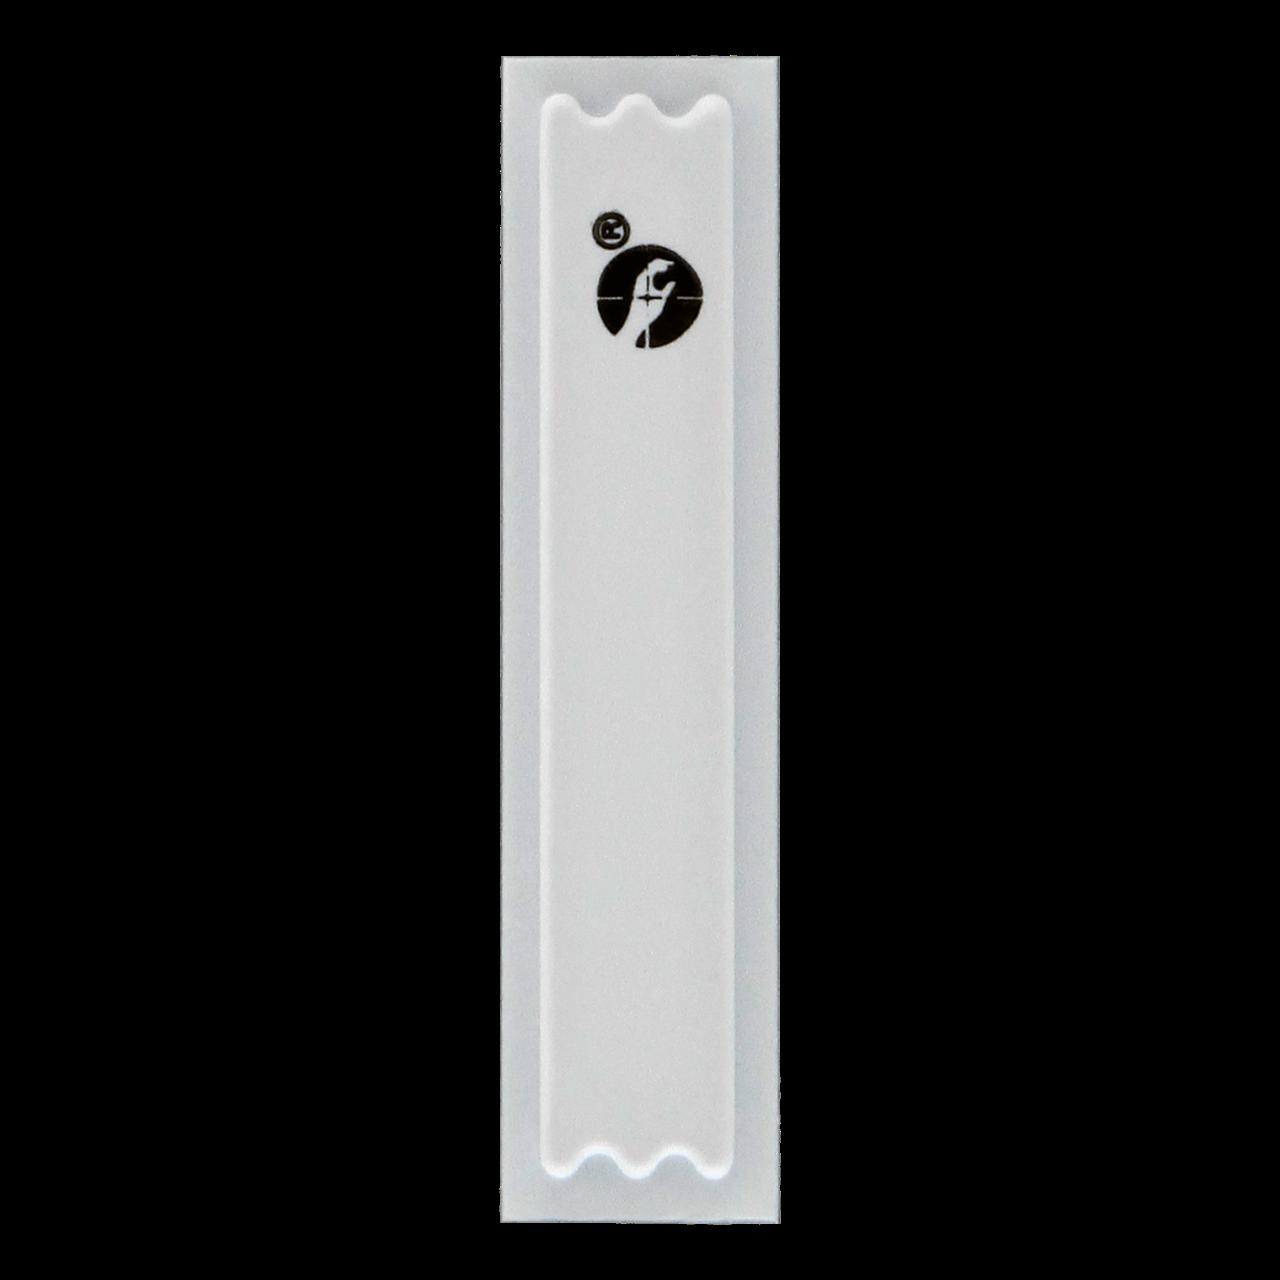 Sensormatic Ultra•Strip III Low Profile Roll Label in Armenia, Vantag LLC